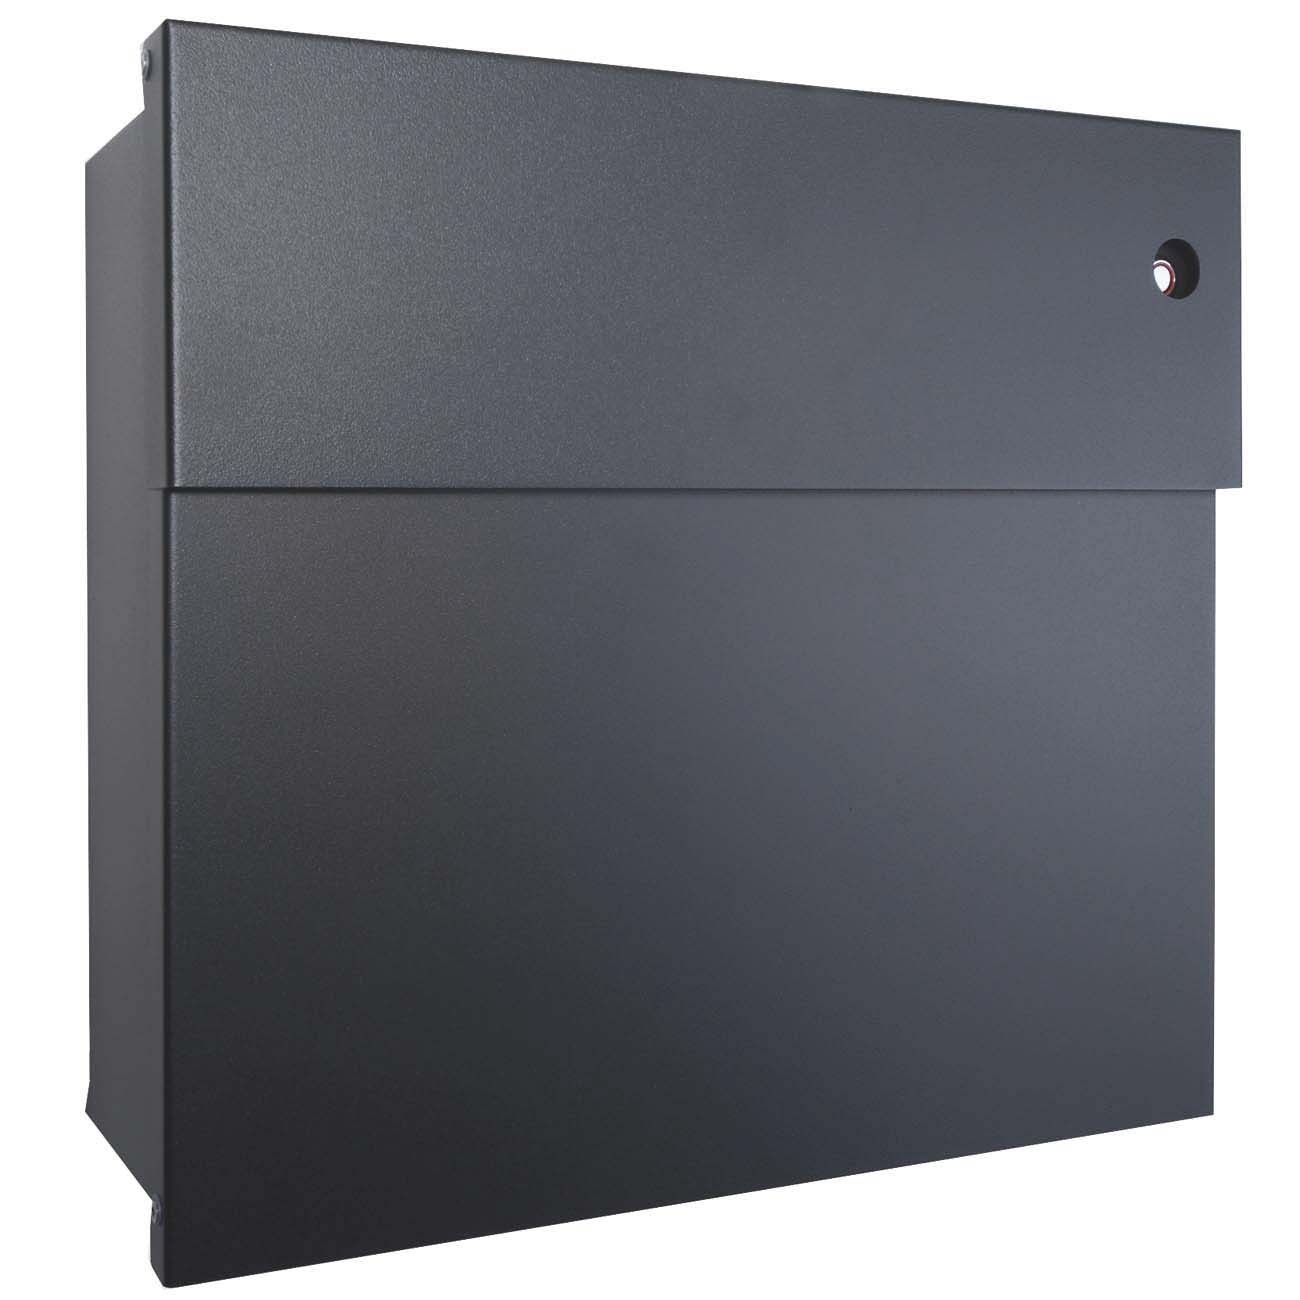 radius briefkasten letterman 4 anthrazitgrau ral 7016 mit klingel rot 560 g kr eingang. Black Bedroom Furniture Sets. Home Design Ideas